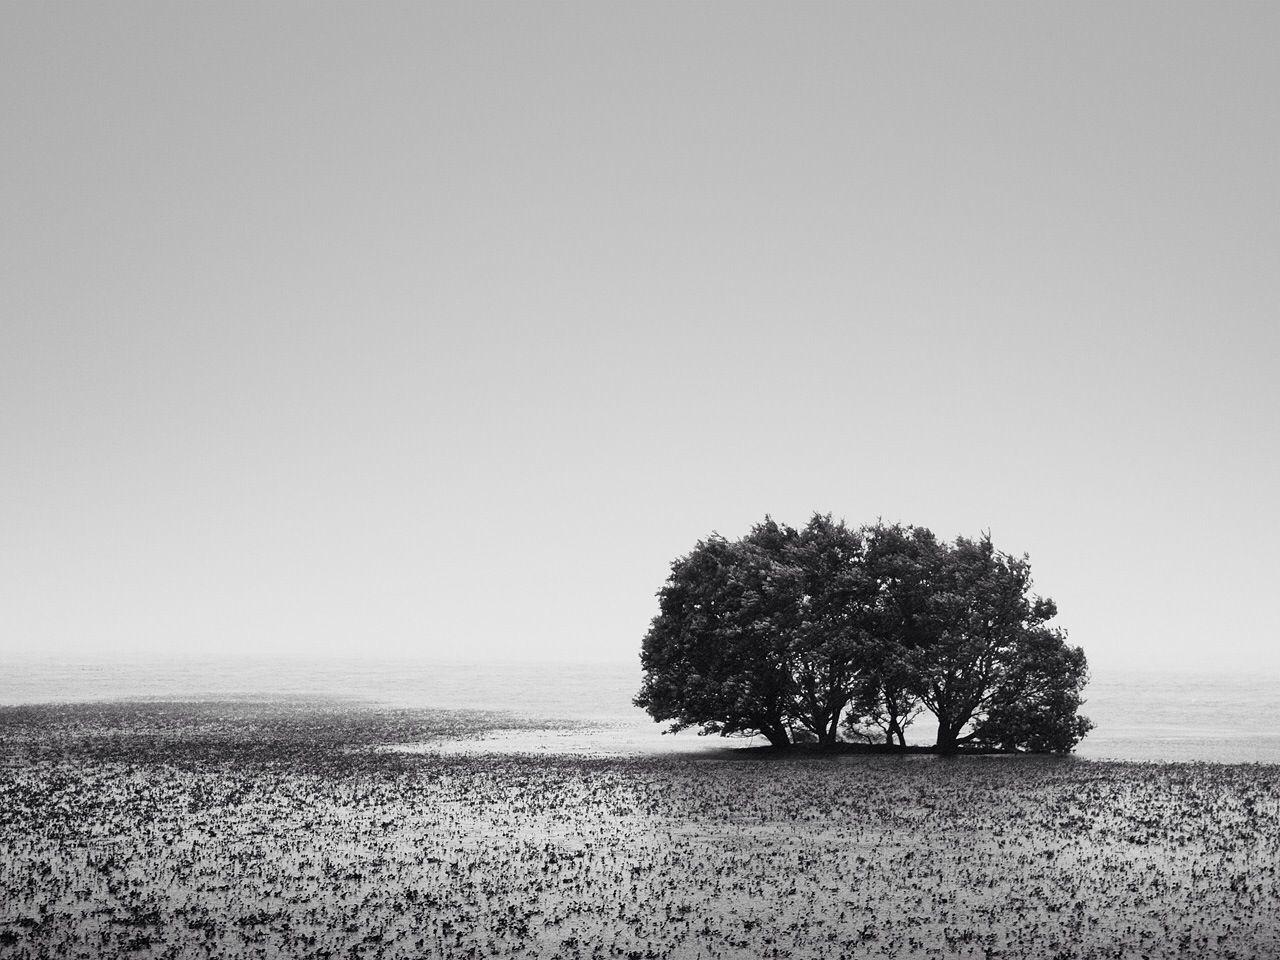 Trees in marshland